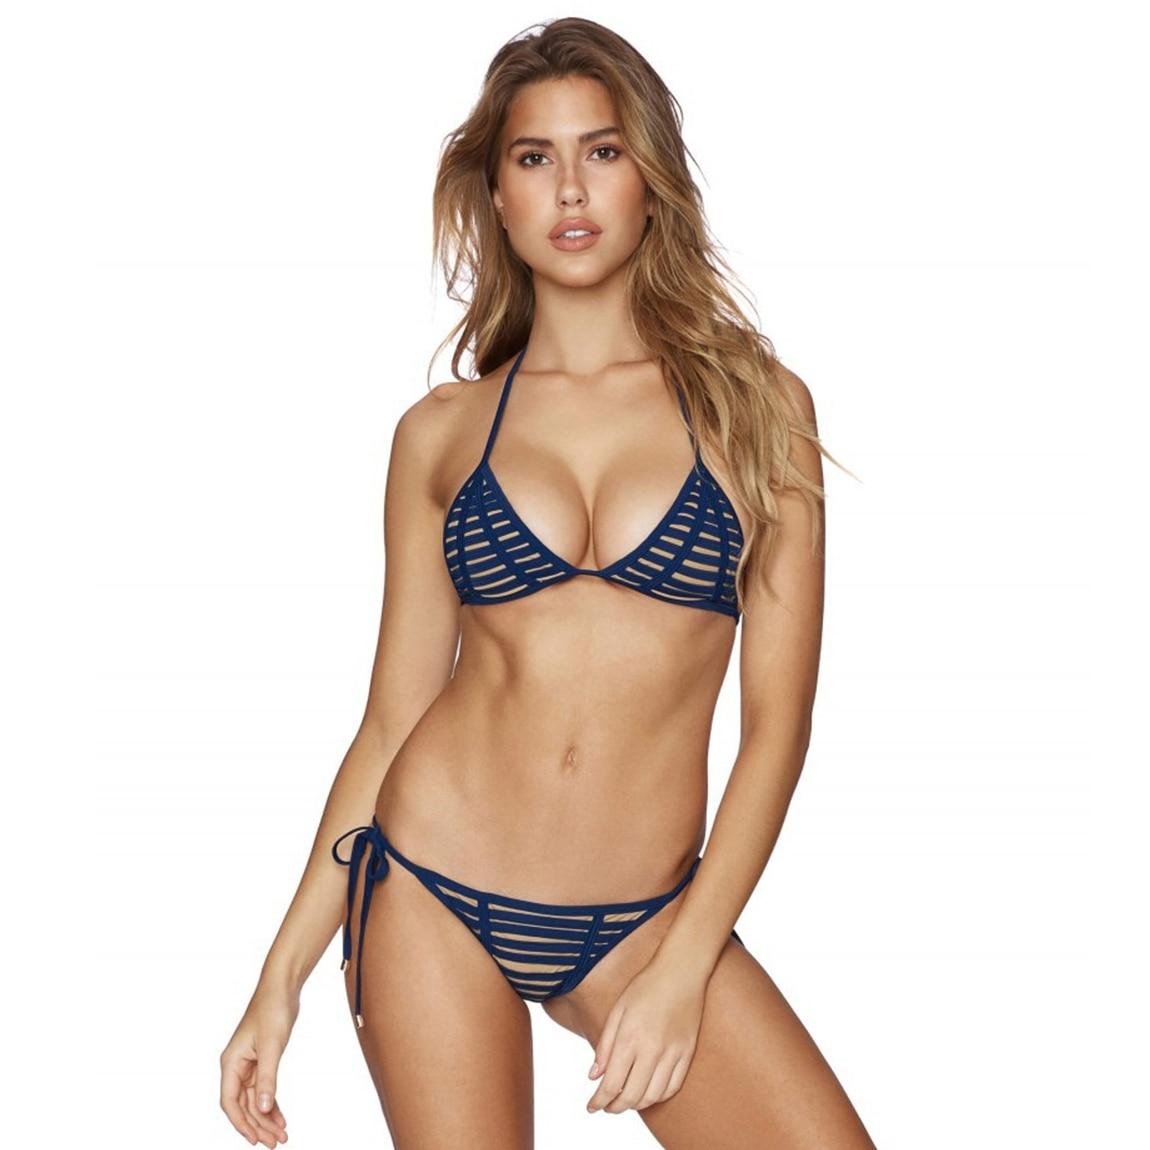 Bikini Striped Brazilian Bikini Push Up Cut Out Swimsuit Women Cheeky Bikinis High Cut Swimwear Bandage Bikinis Set